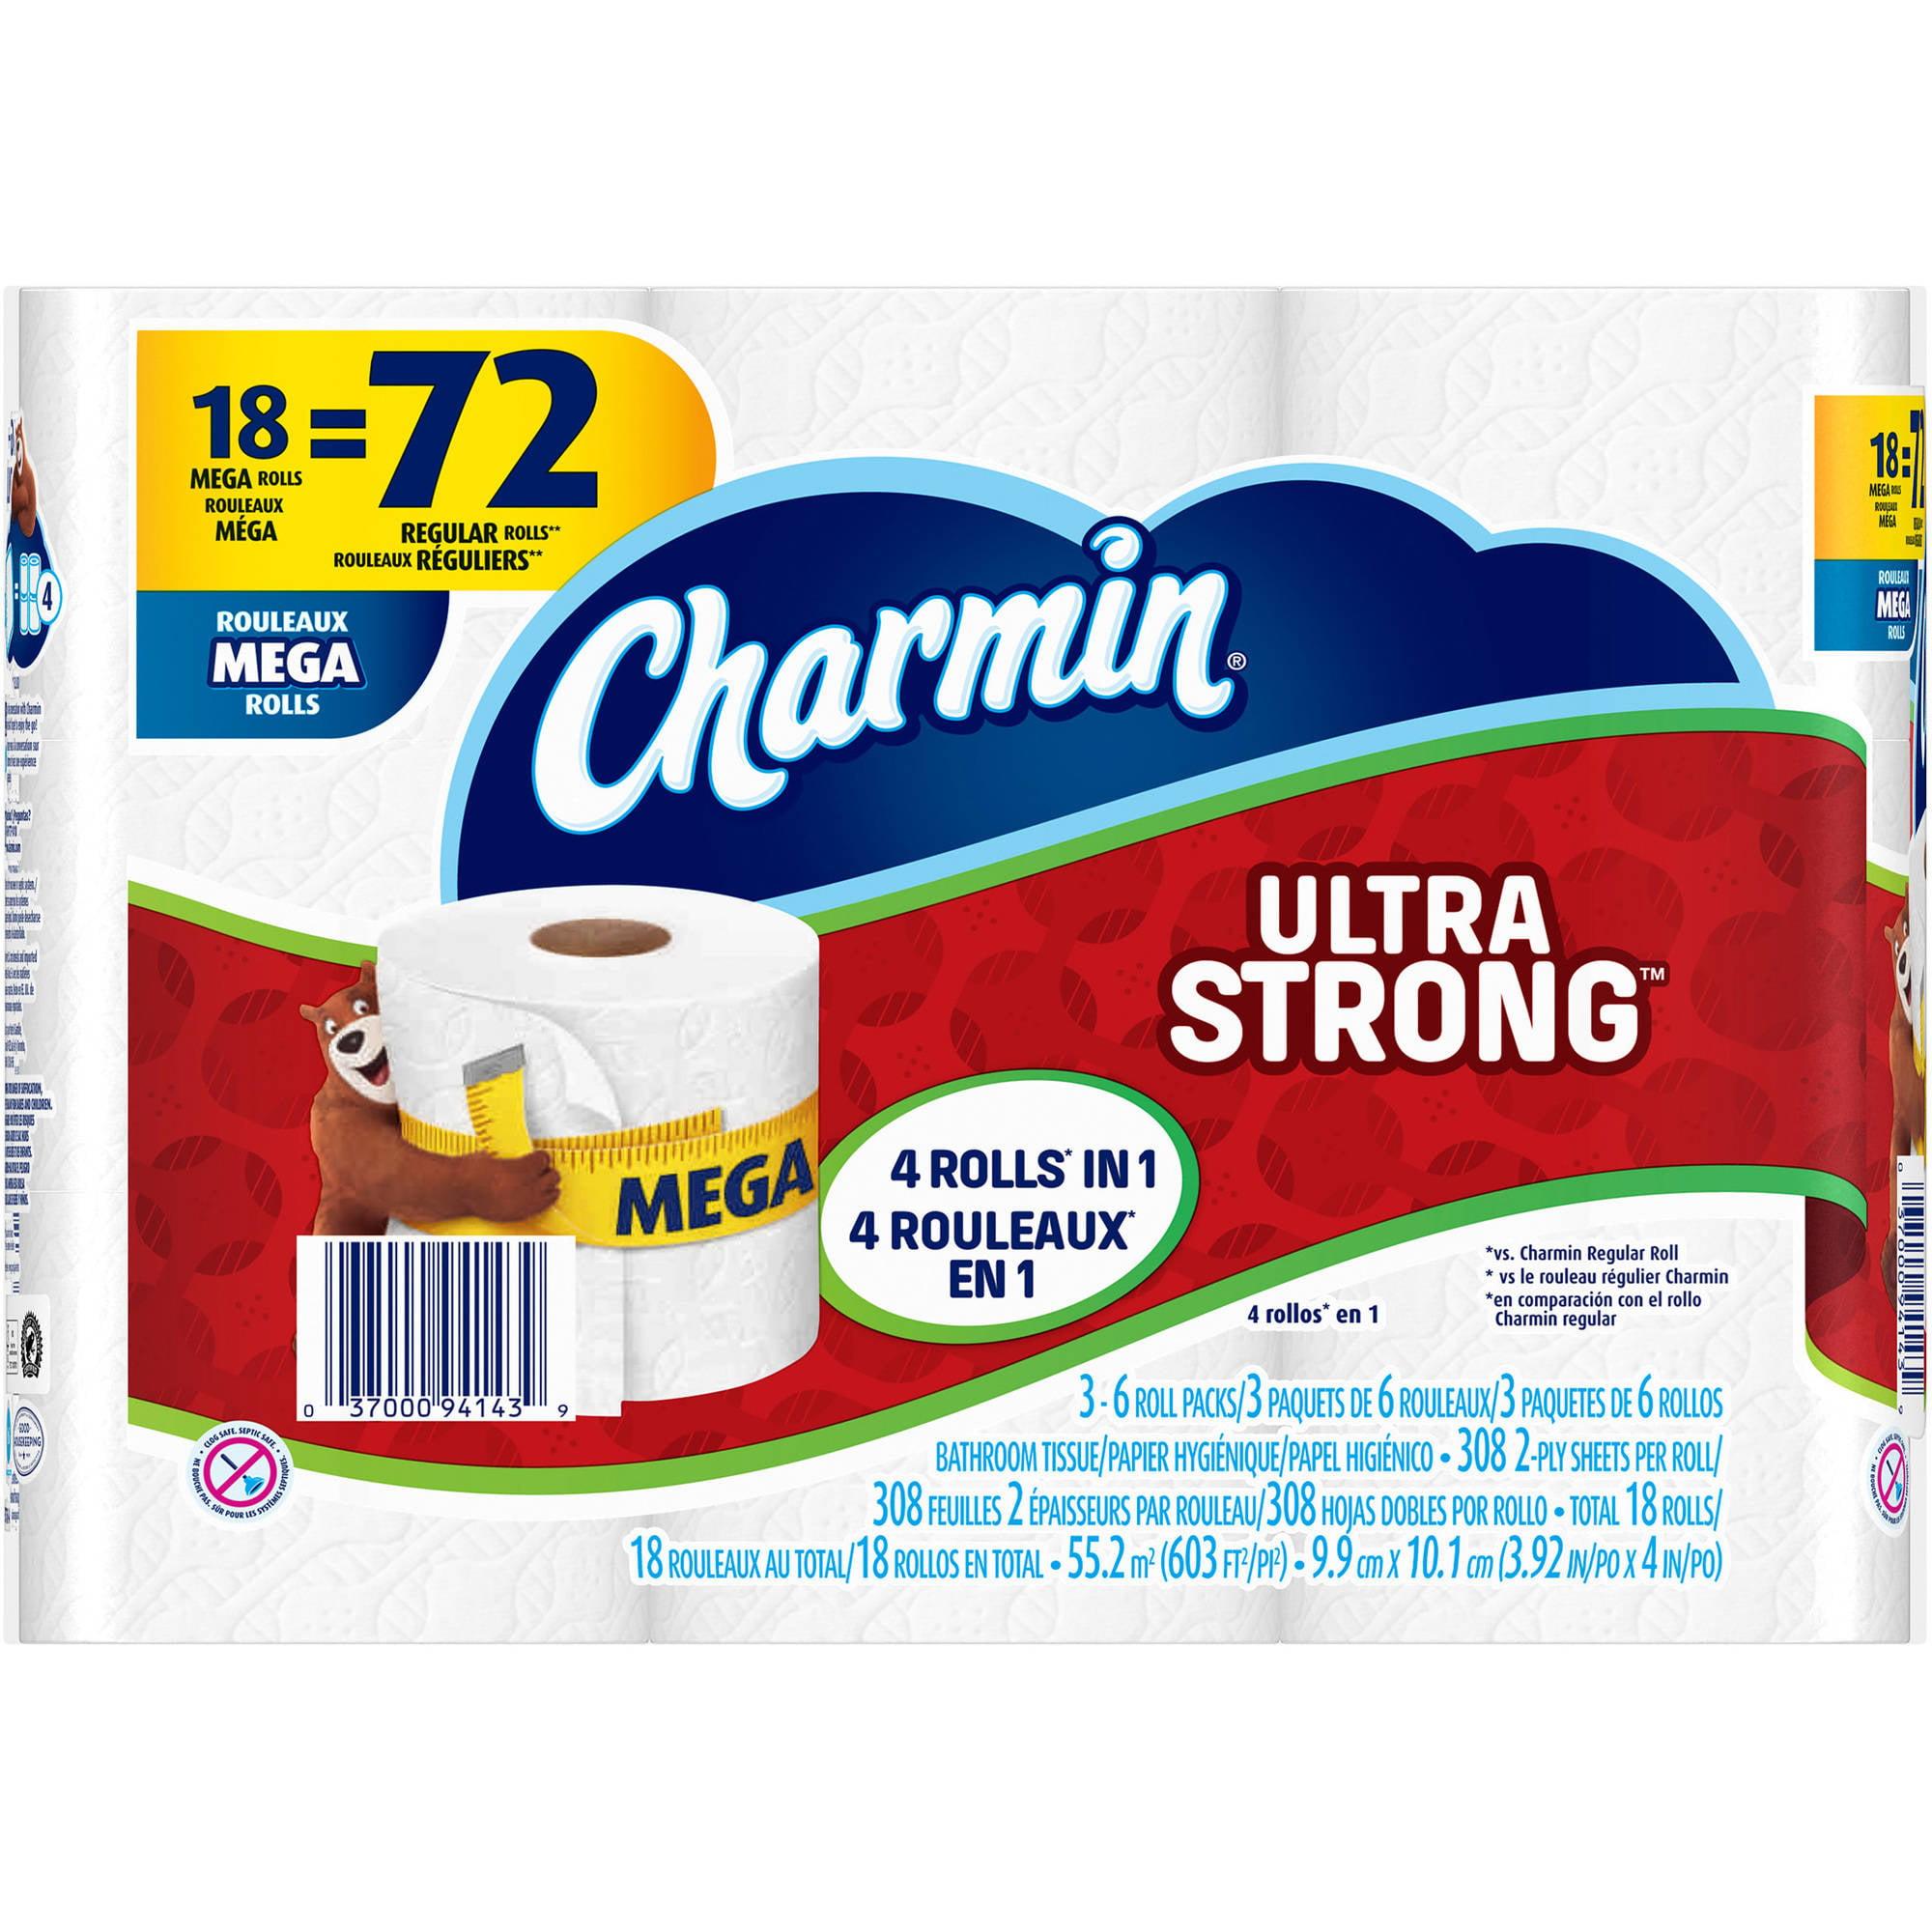 Charmin Ultra Strong Toilet Paper Mega Rolls, 308 sheets, 18 rolls